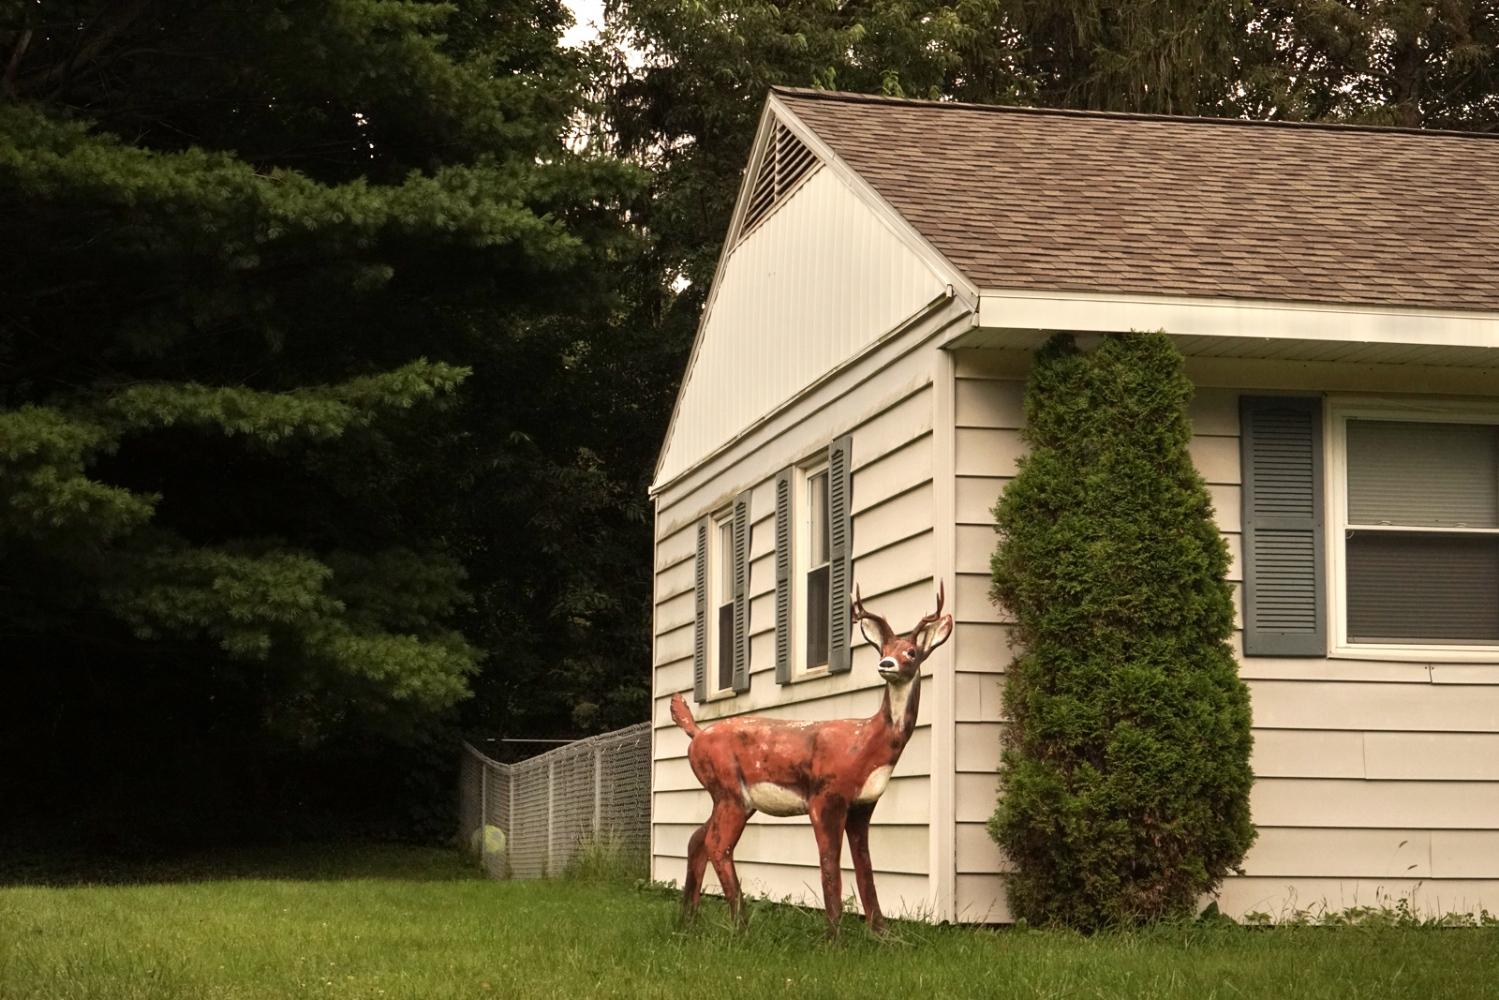 Fake Deer, Clinton, NY